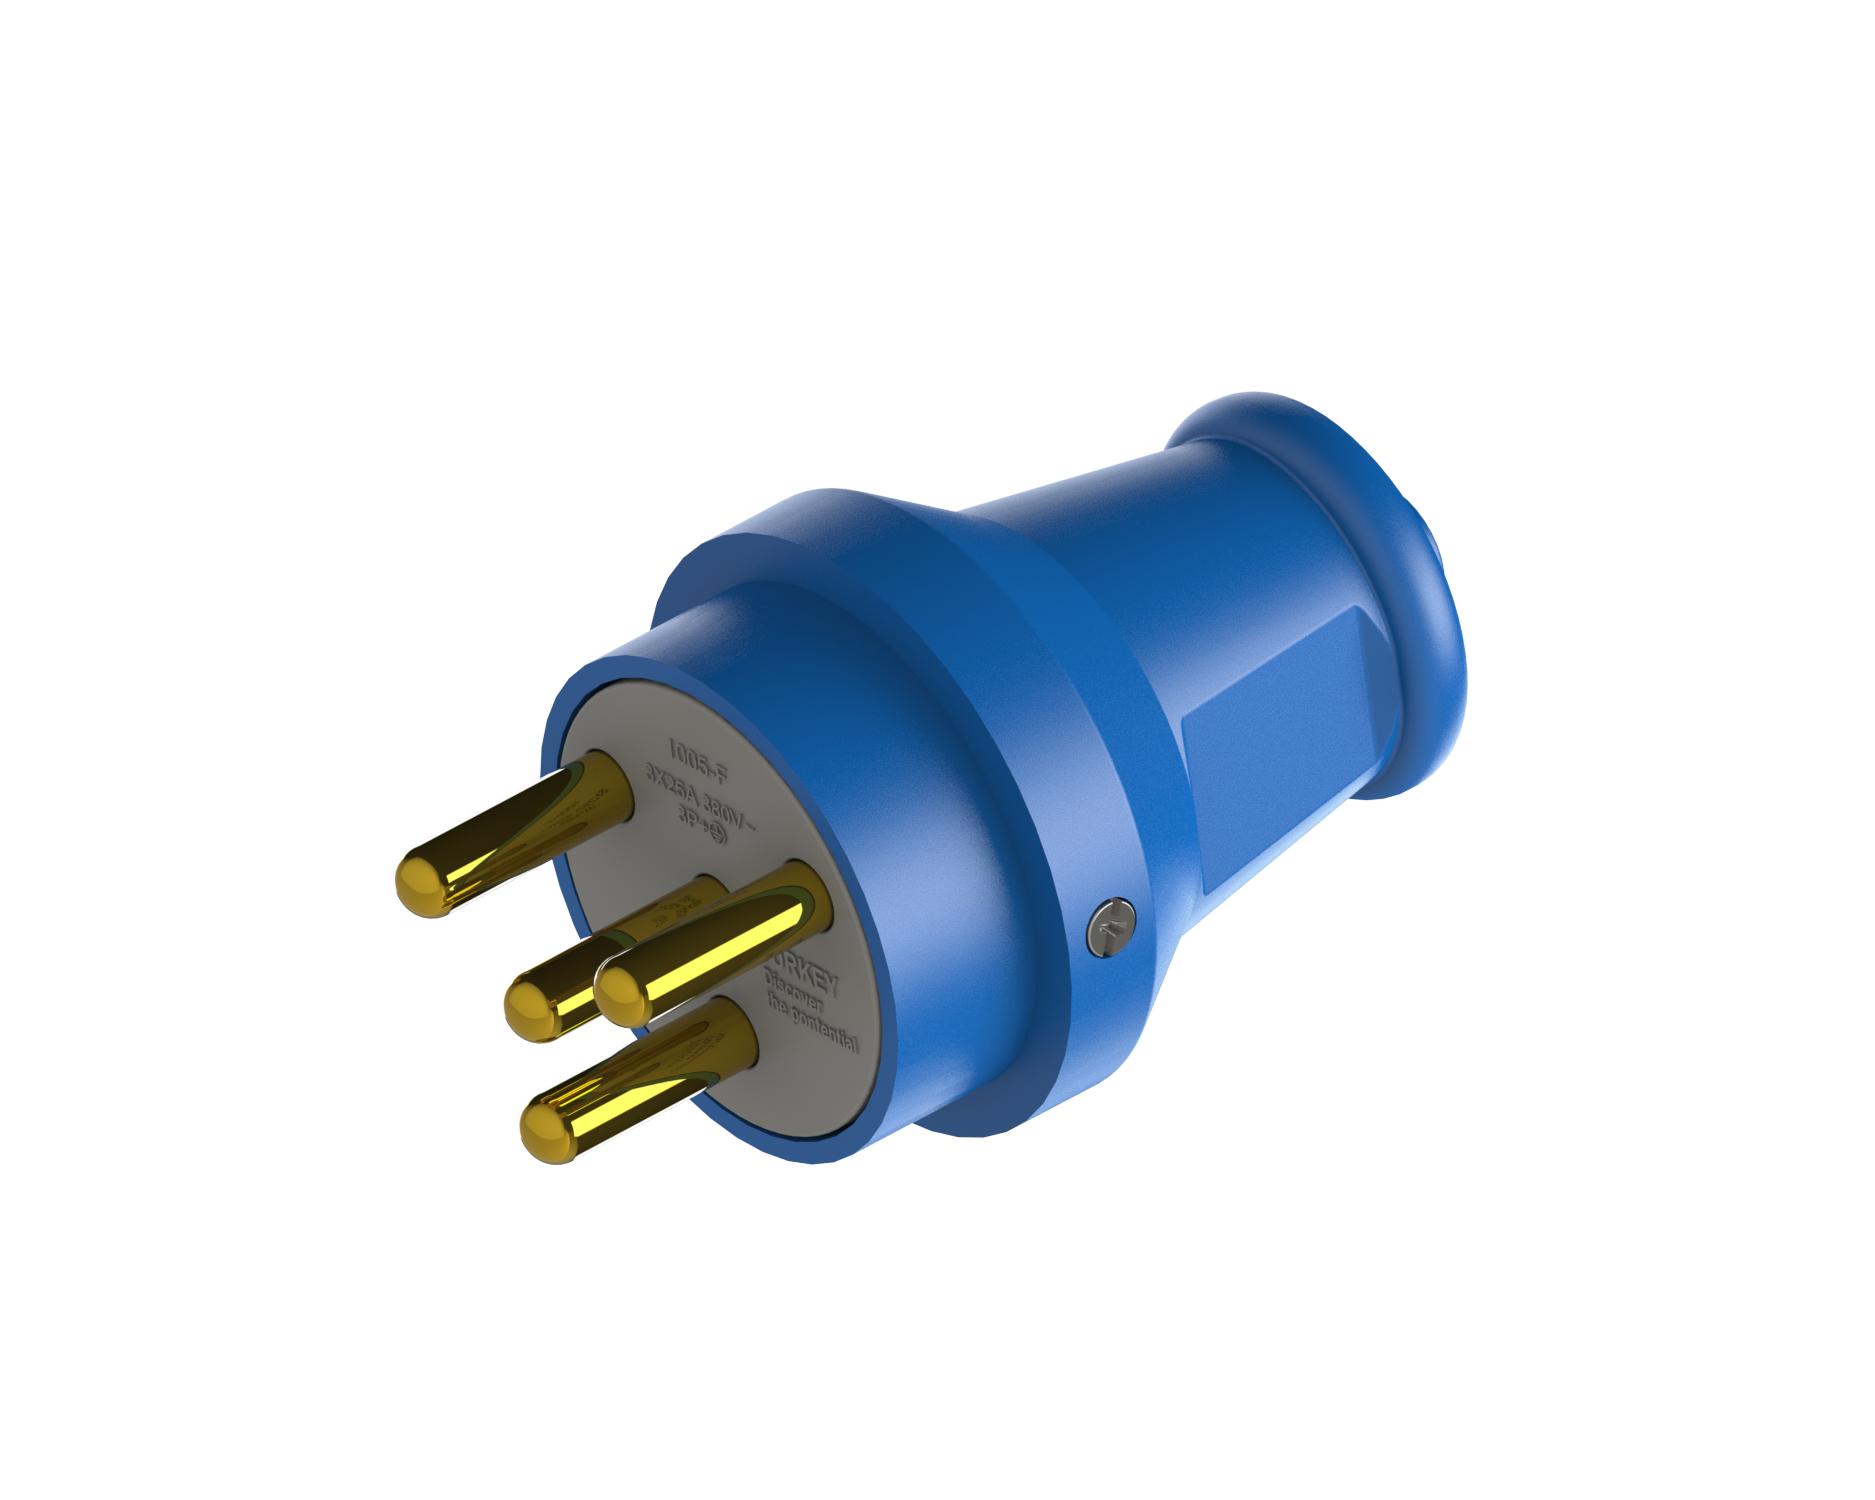 3*25 A Three Phase Plug / 1005-F